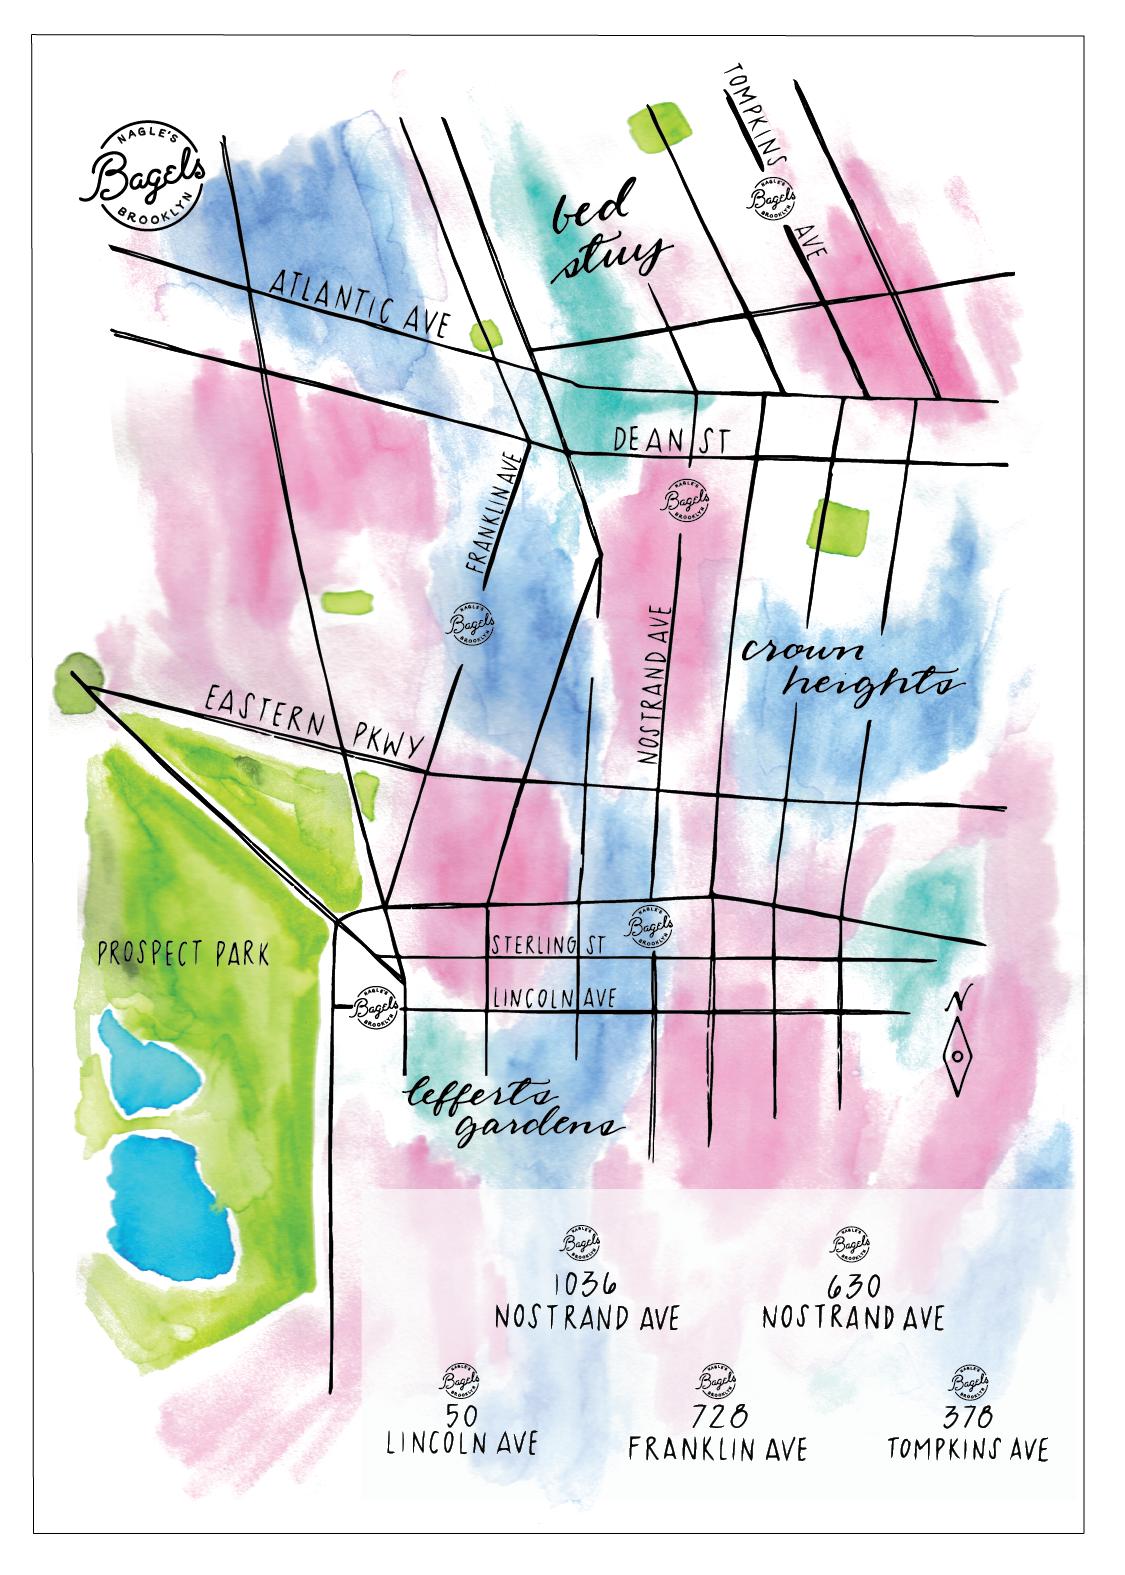 NB_Bagel Hunt Map_FINAL_B-01.png